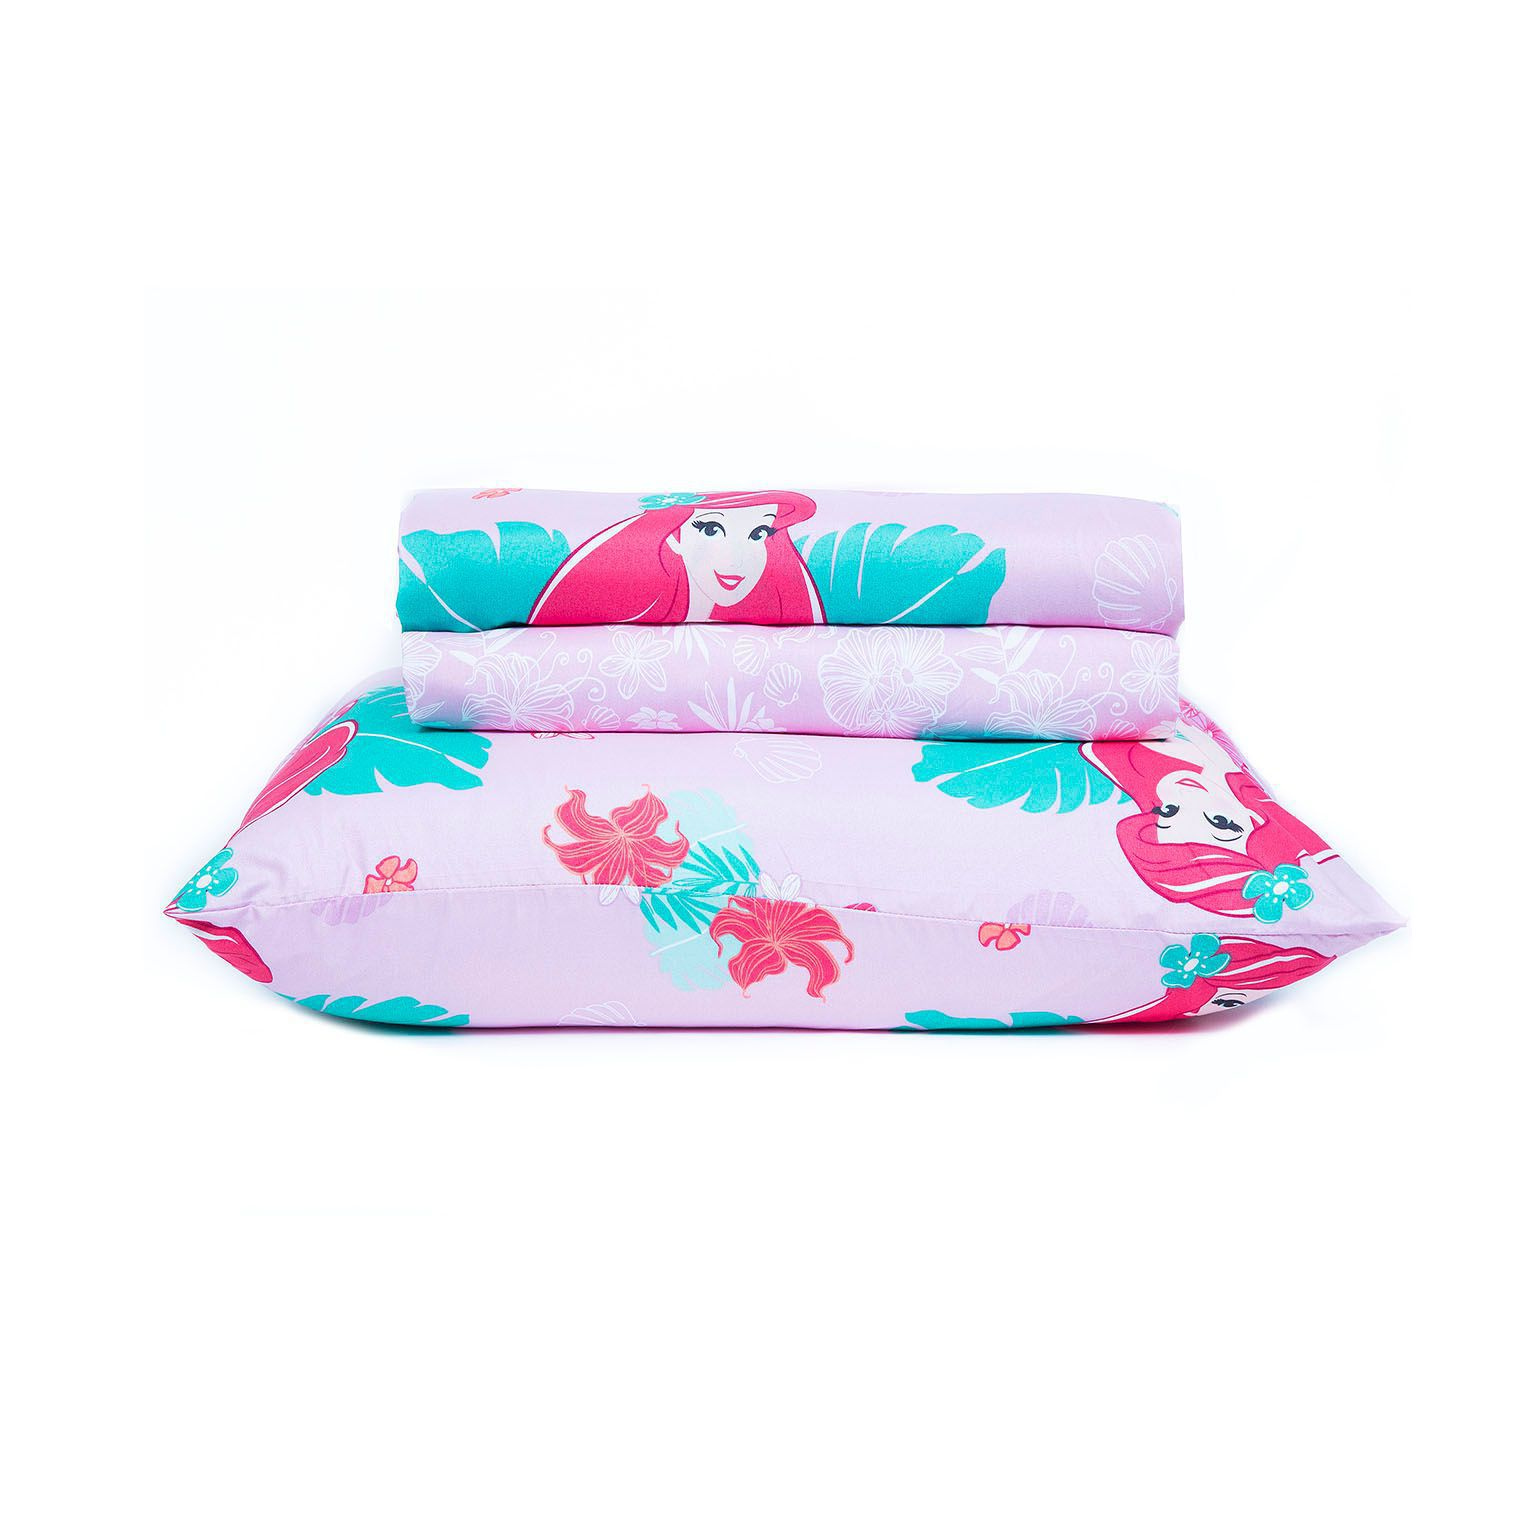 Kit Infantil Rosa Ariel Pequena Sereia  Jogo Cama + Cortina Santista